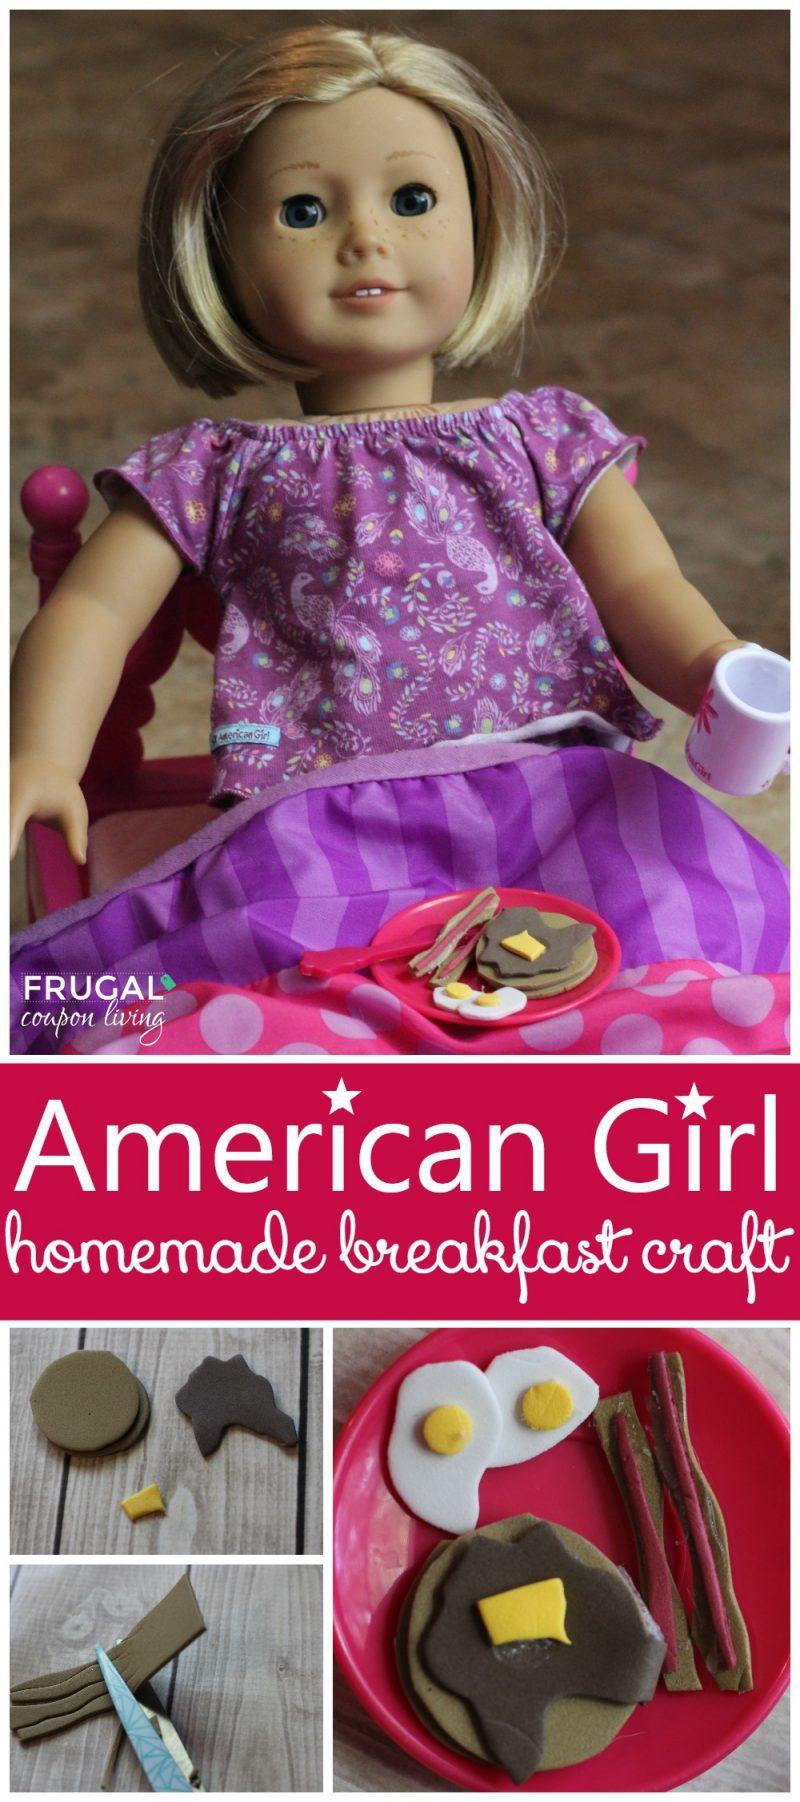 American-Girl-Homemade-Breakfast-Craft